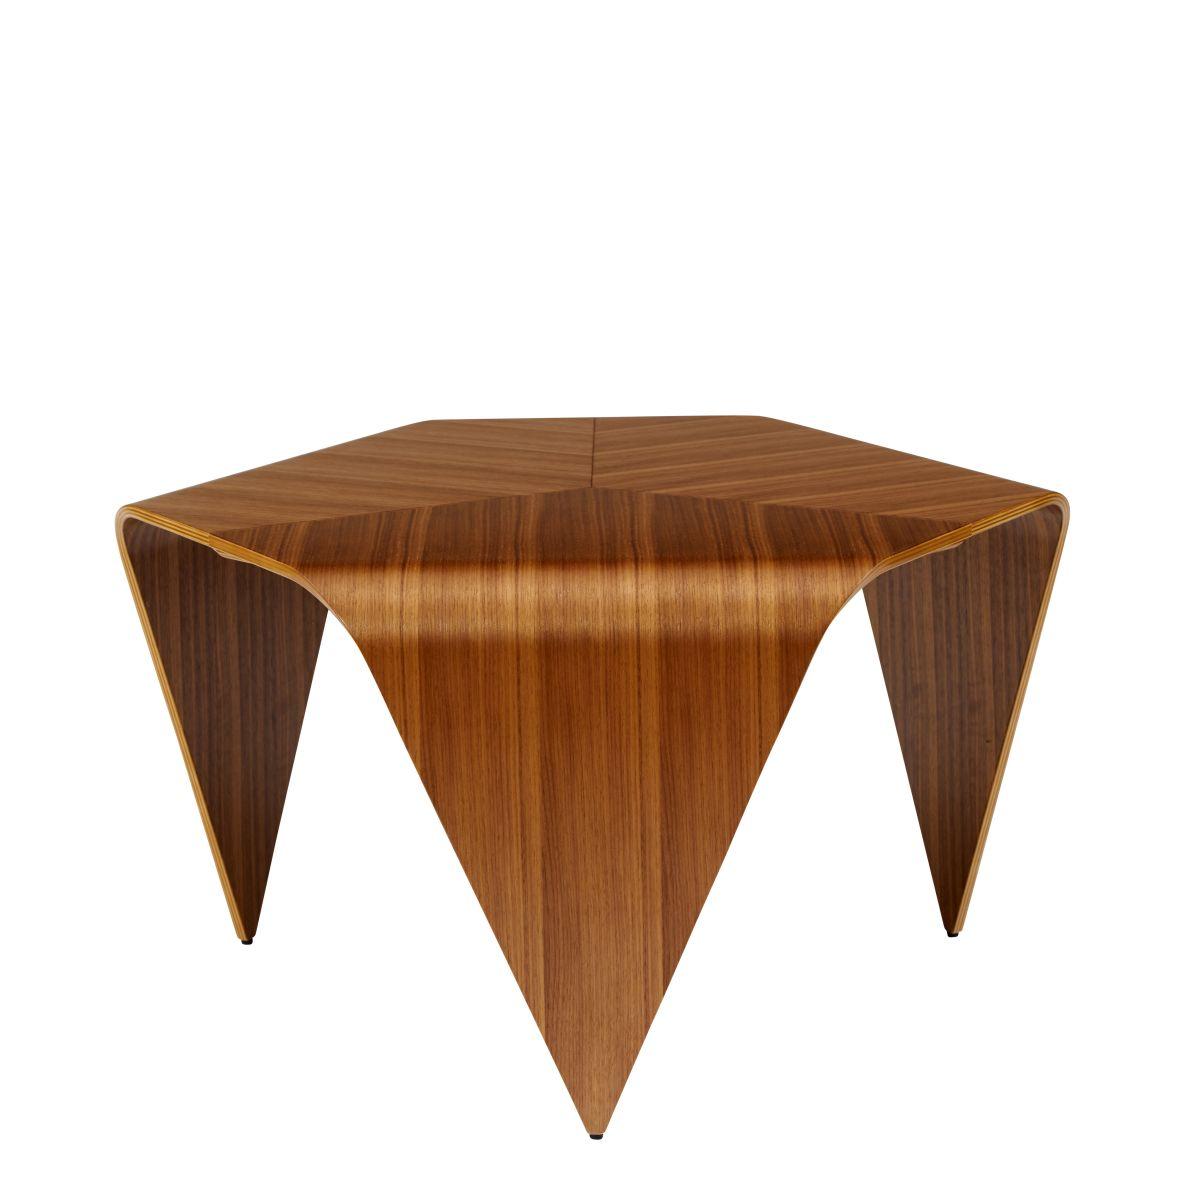 Trienna-Table-walnut-2627428